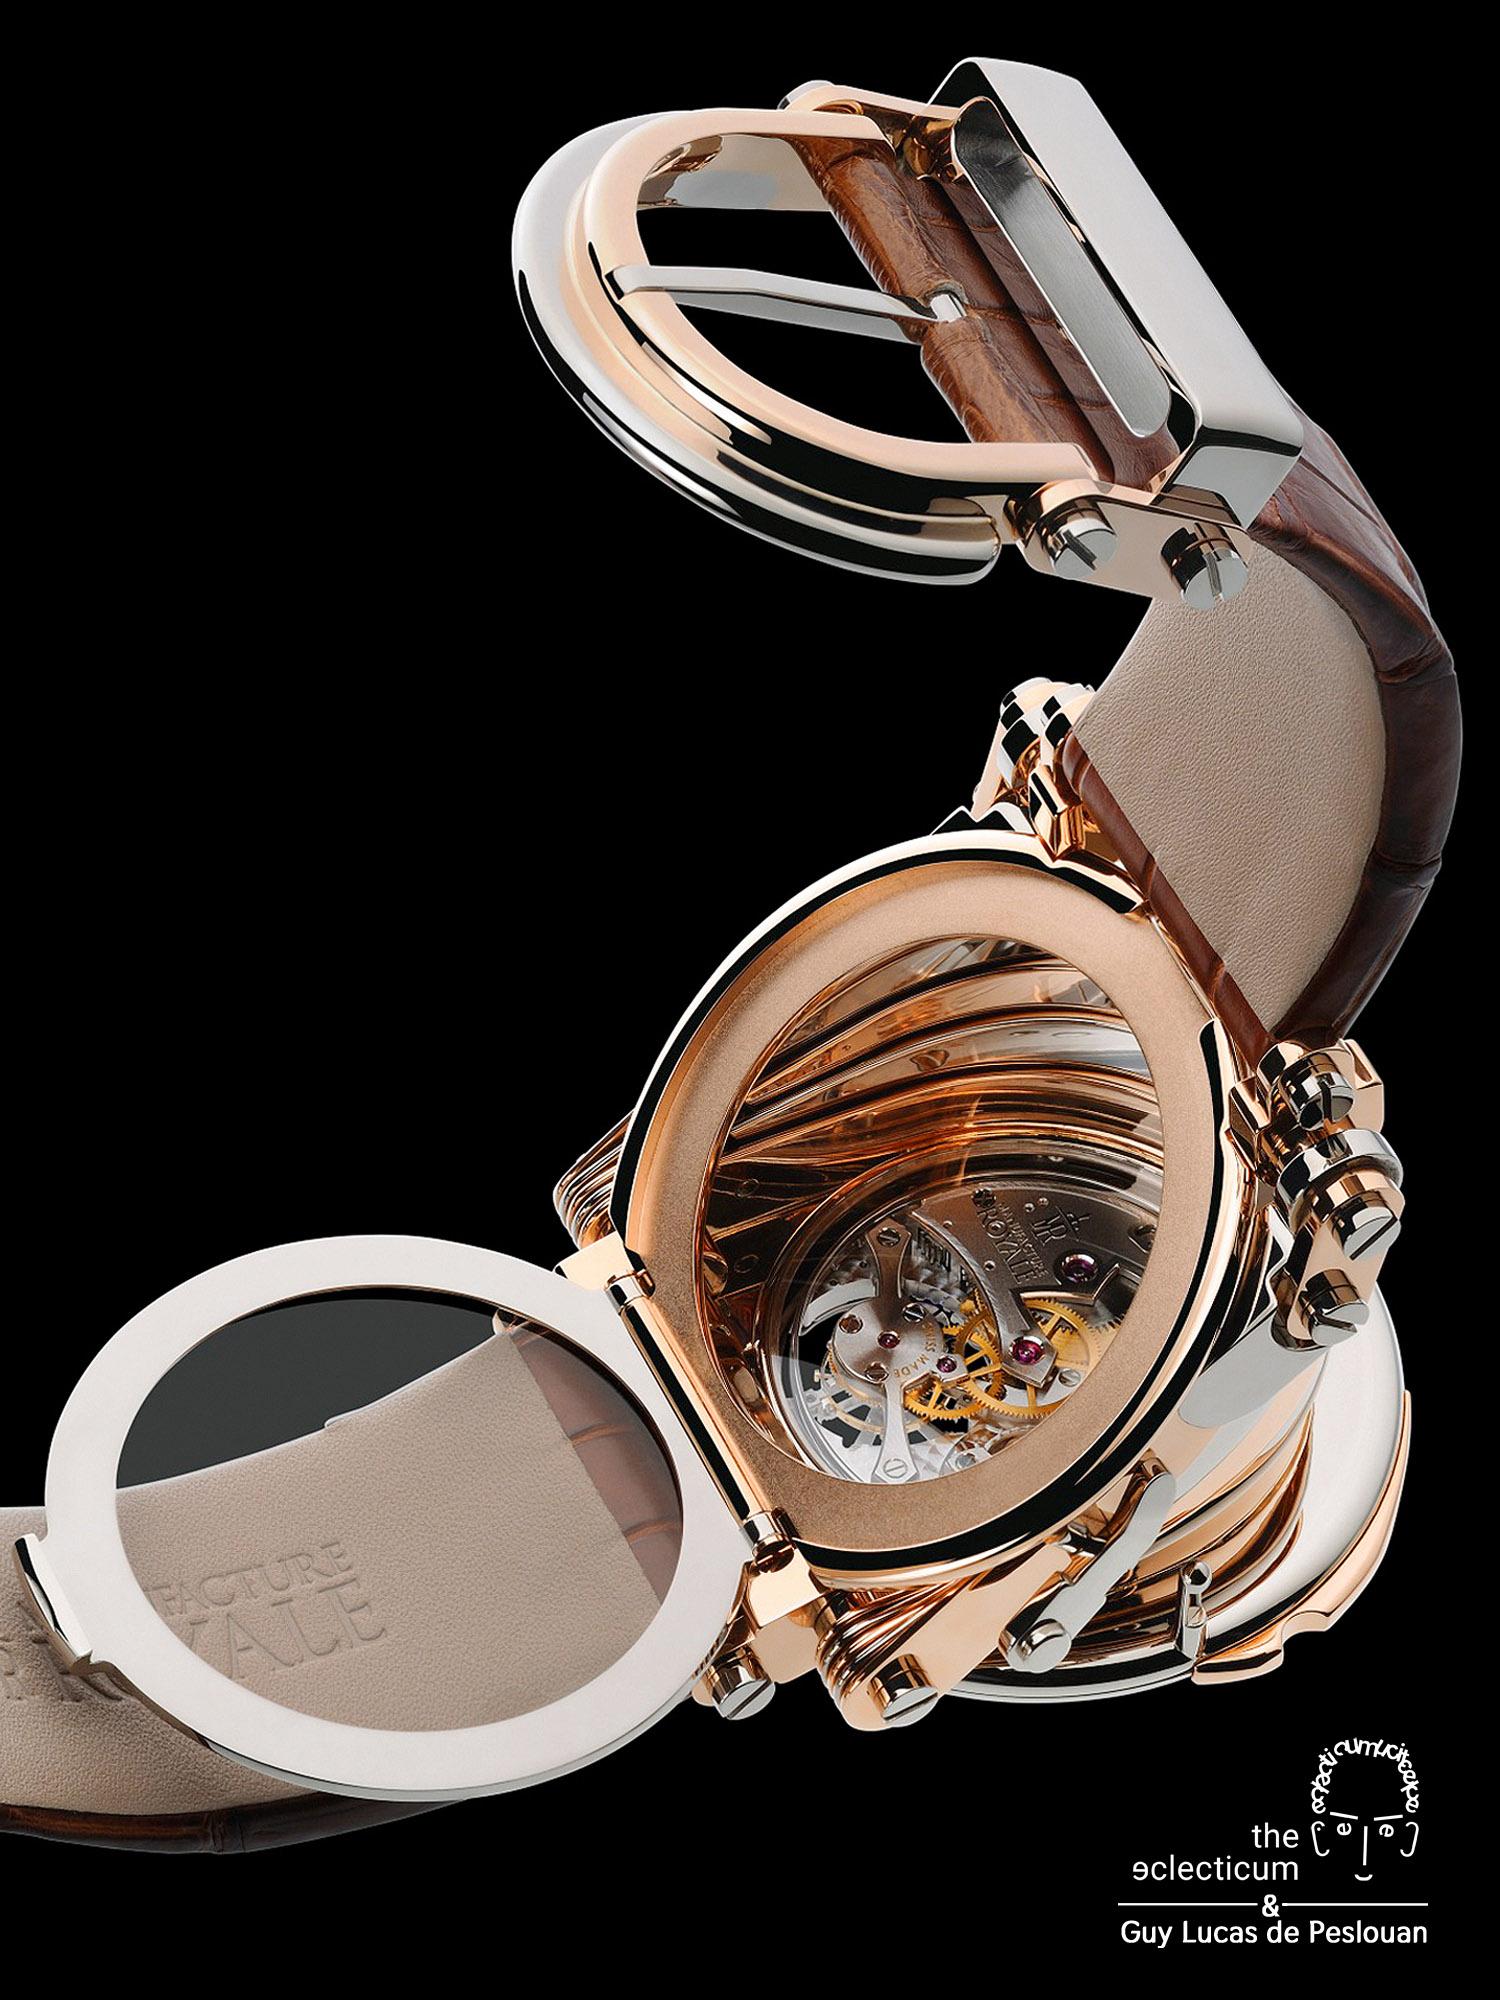 Manufacture Royale Opéra Tourbillon Minute Repeater Silicon Escapement